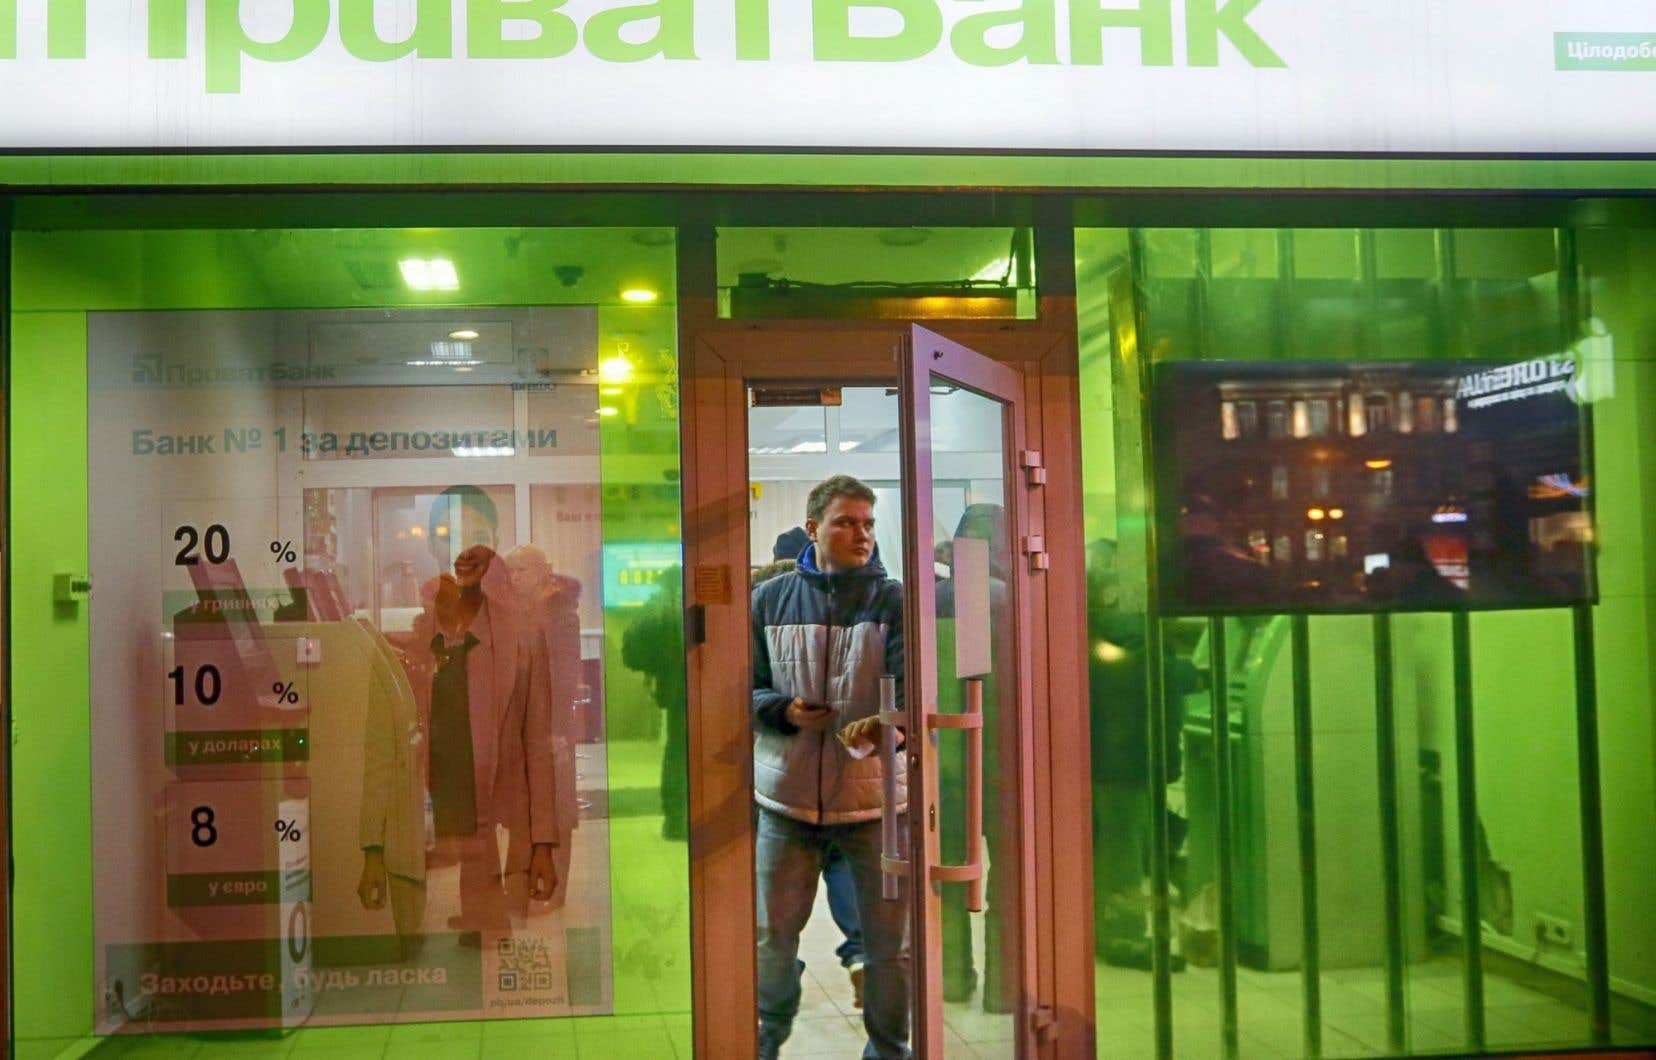 Succursale de la PrivatBank, à Kiev